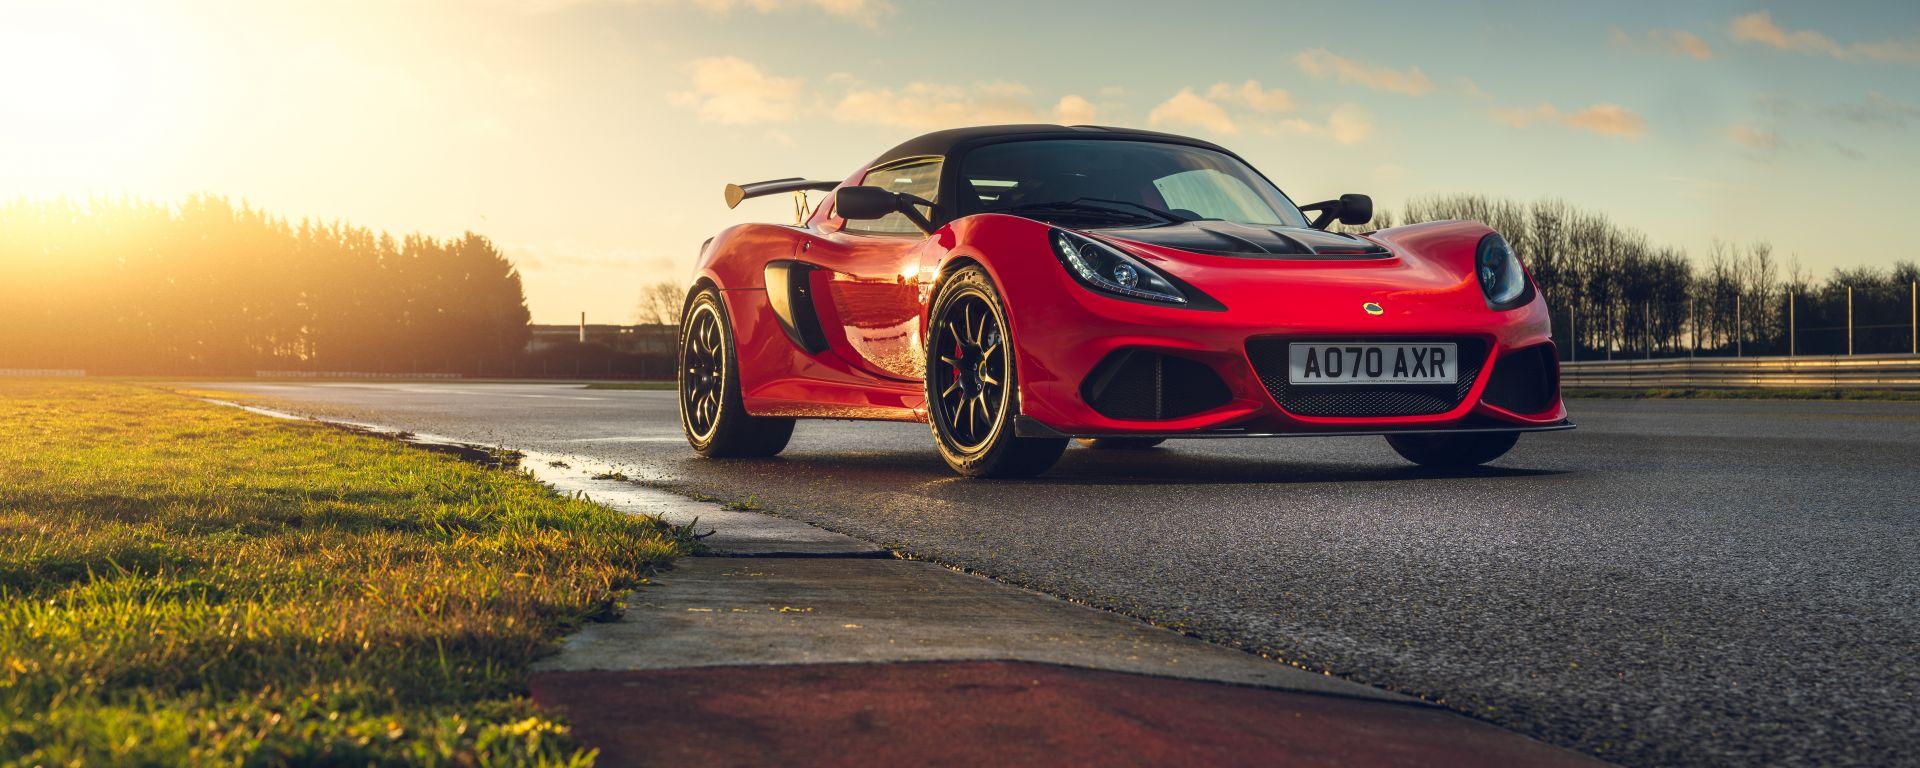 Lotus Exige Sport 420 Final Edition